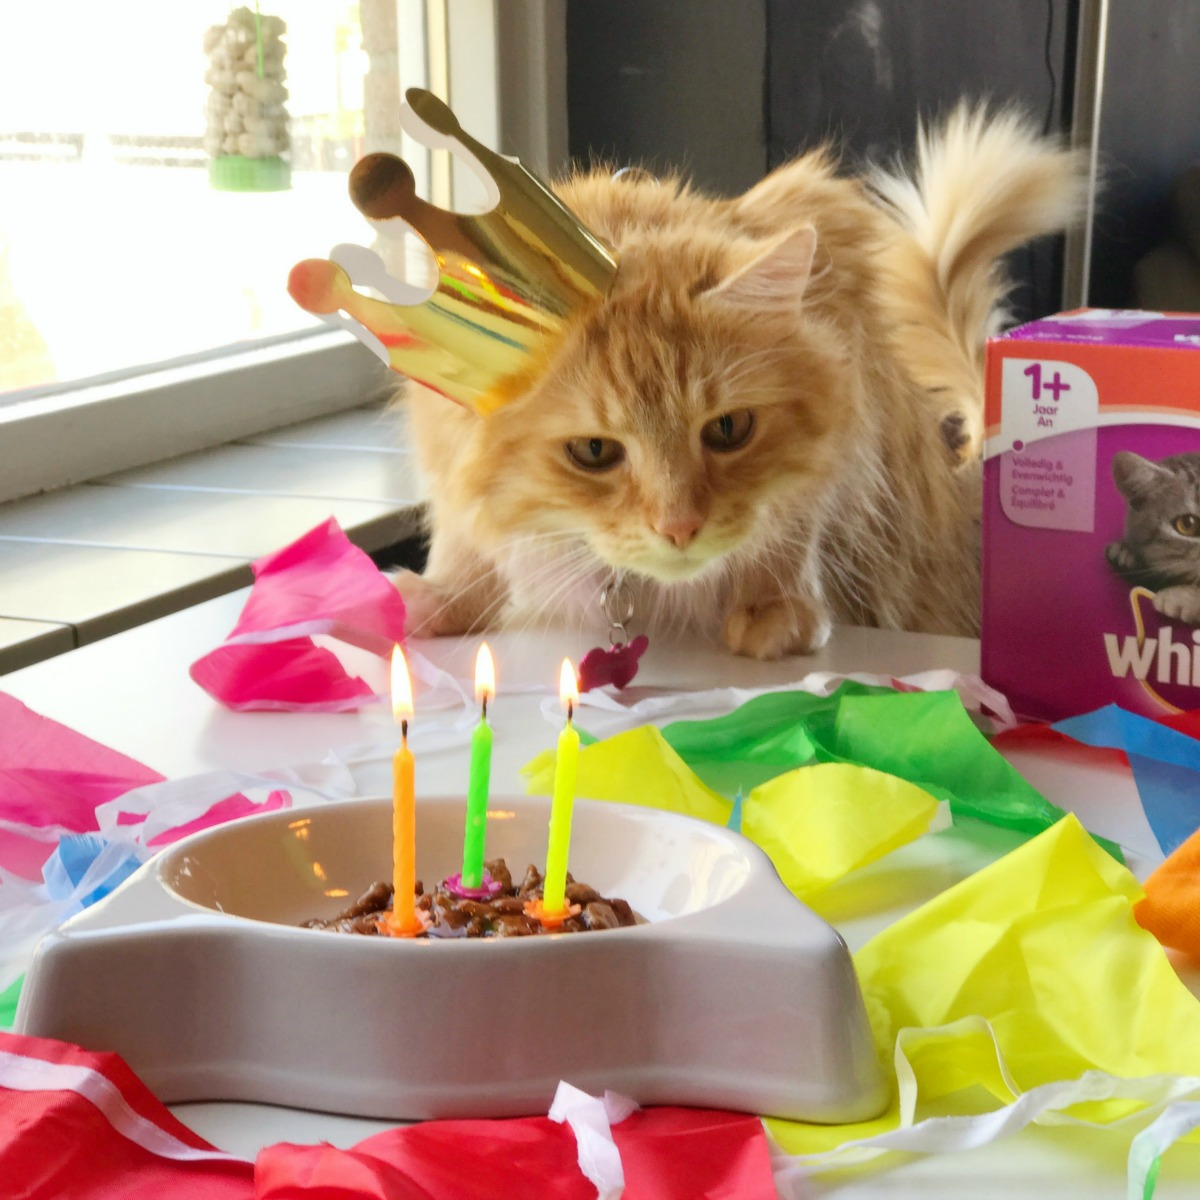 Sintra the Cat 3rd birthday: Enjoying the most favorite part of my birthday